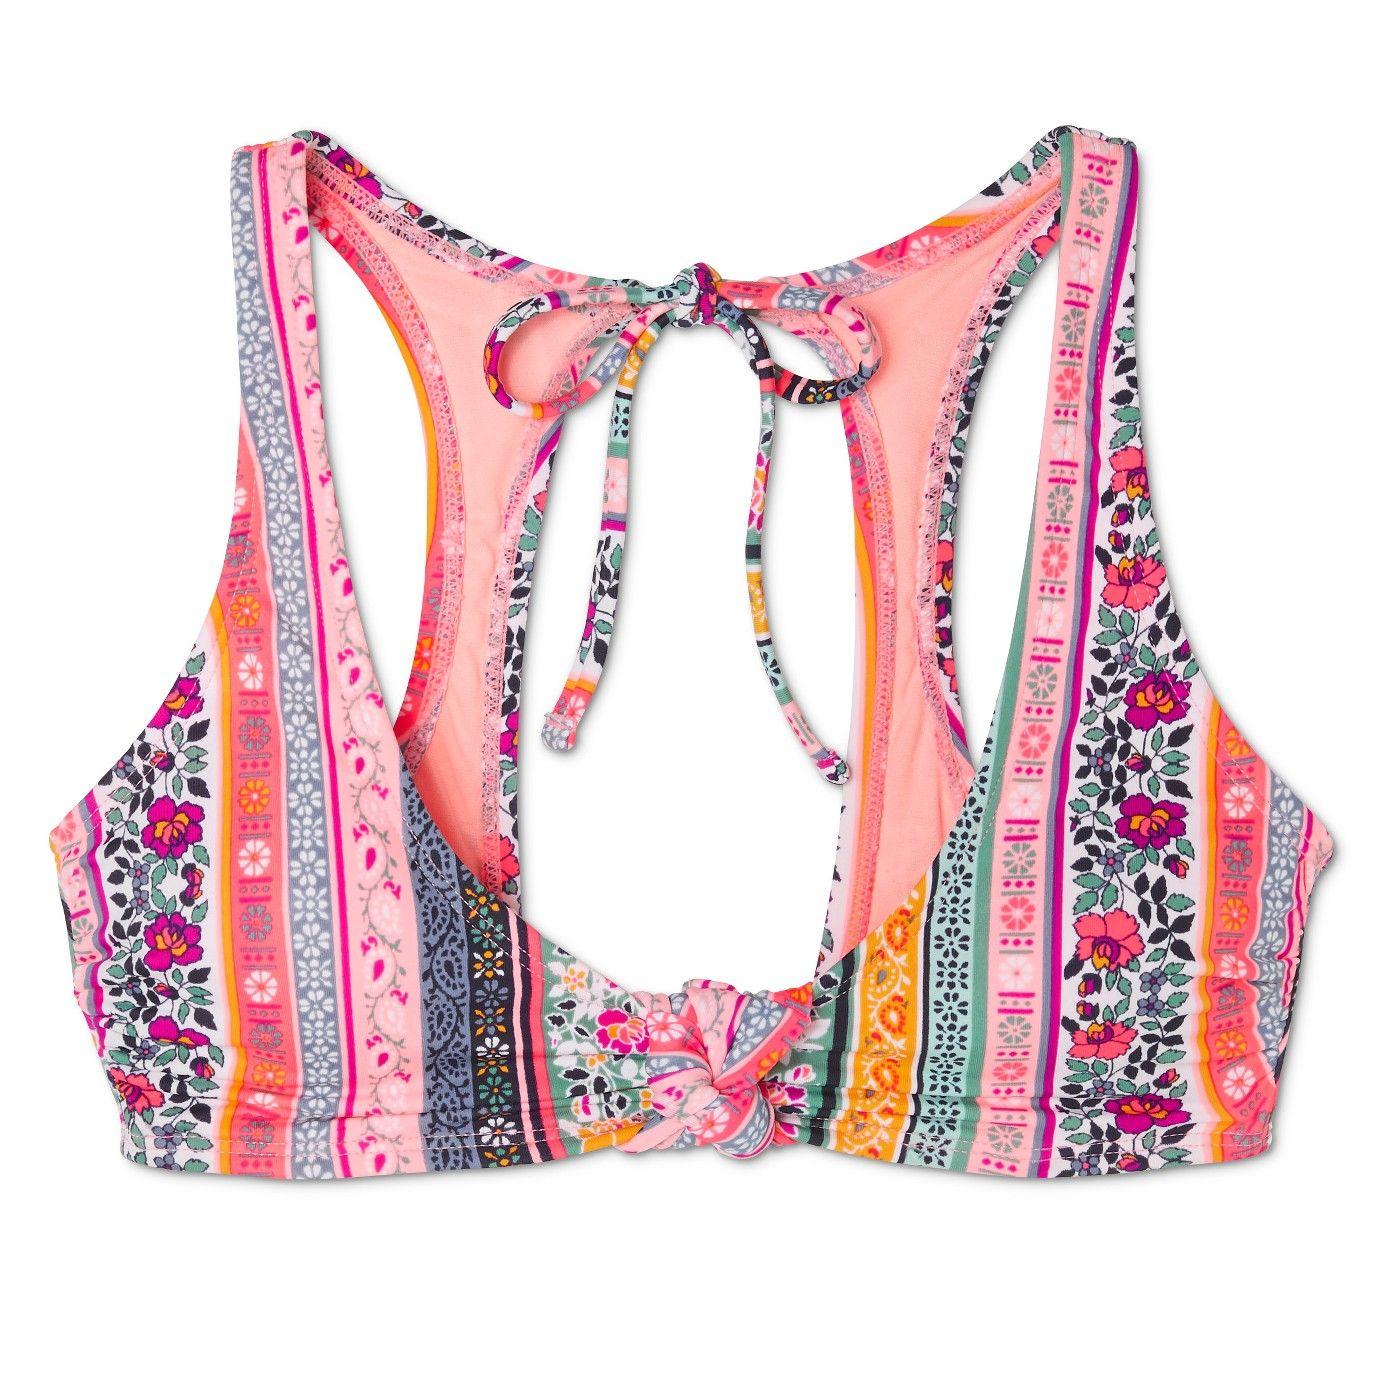 48a208c6f6bcf6 Women s Knot Front Tie Back Bralette Bikini Top - Xhilaration  Pink Boho  Stripe D DD Cup  Tie